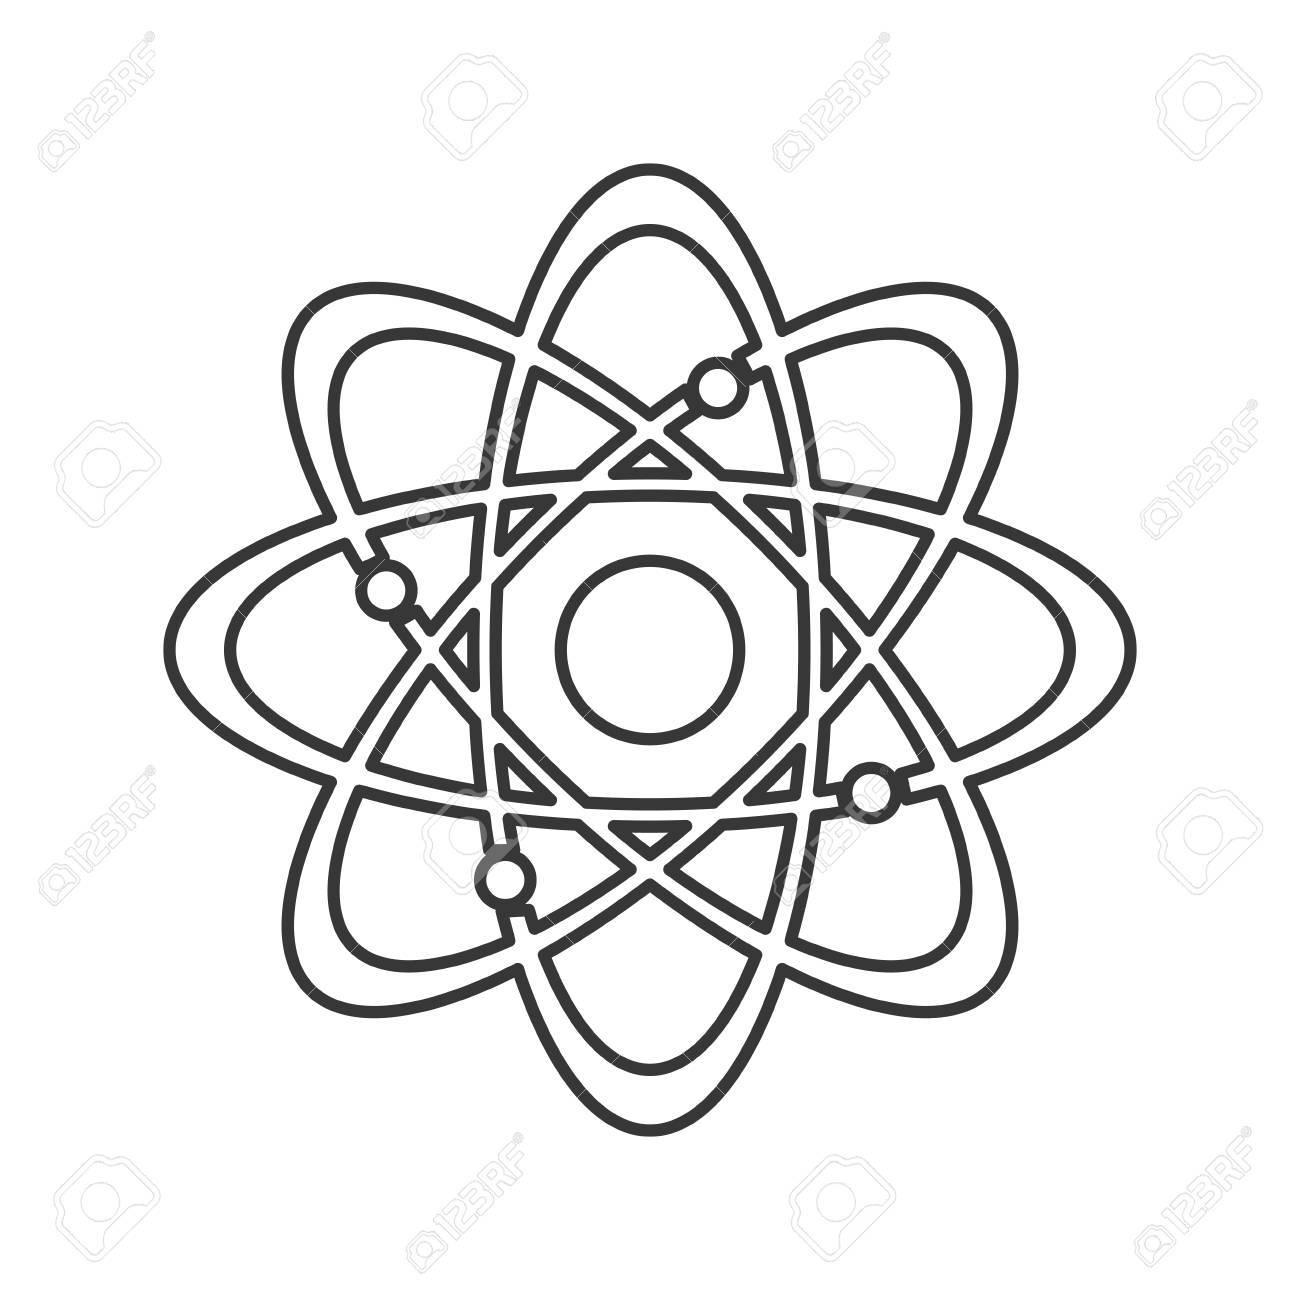 Flat design atom structure icon vector illustration royalty free flat design atom structure icon vector illustration stock vector 61271899 ccuart Images